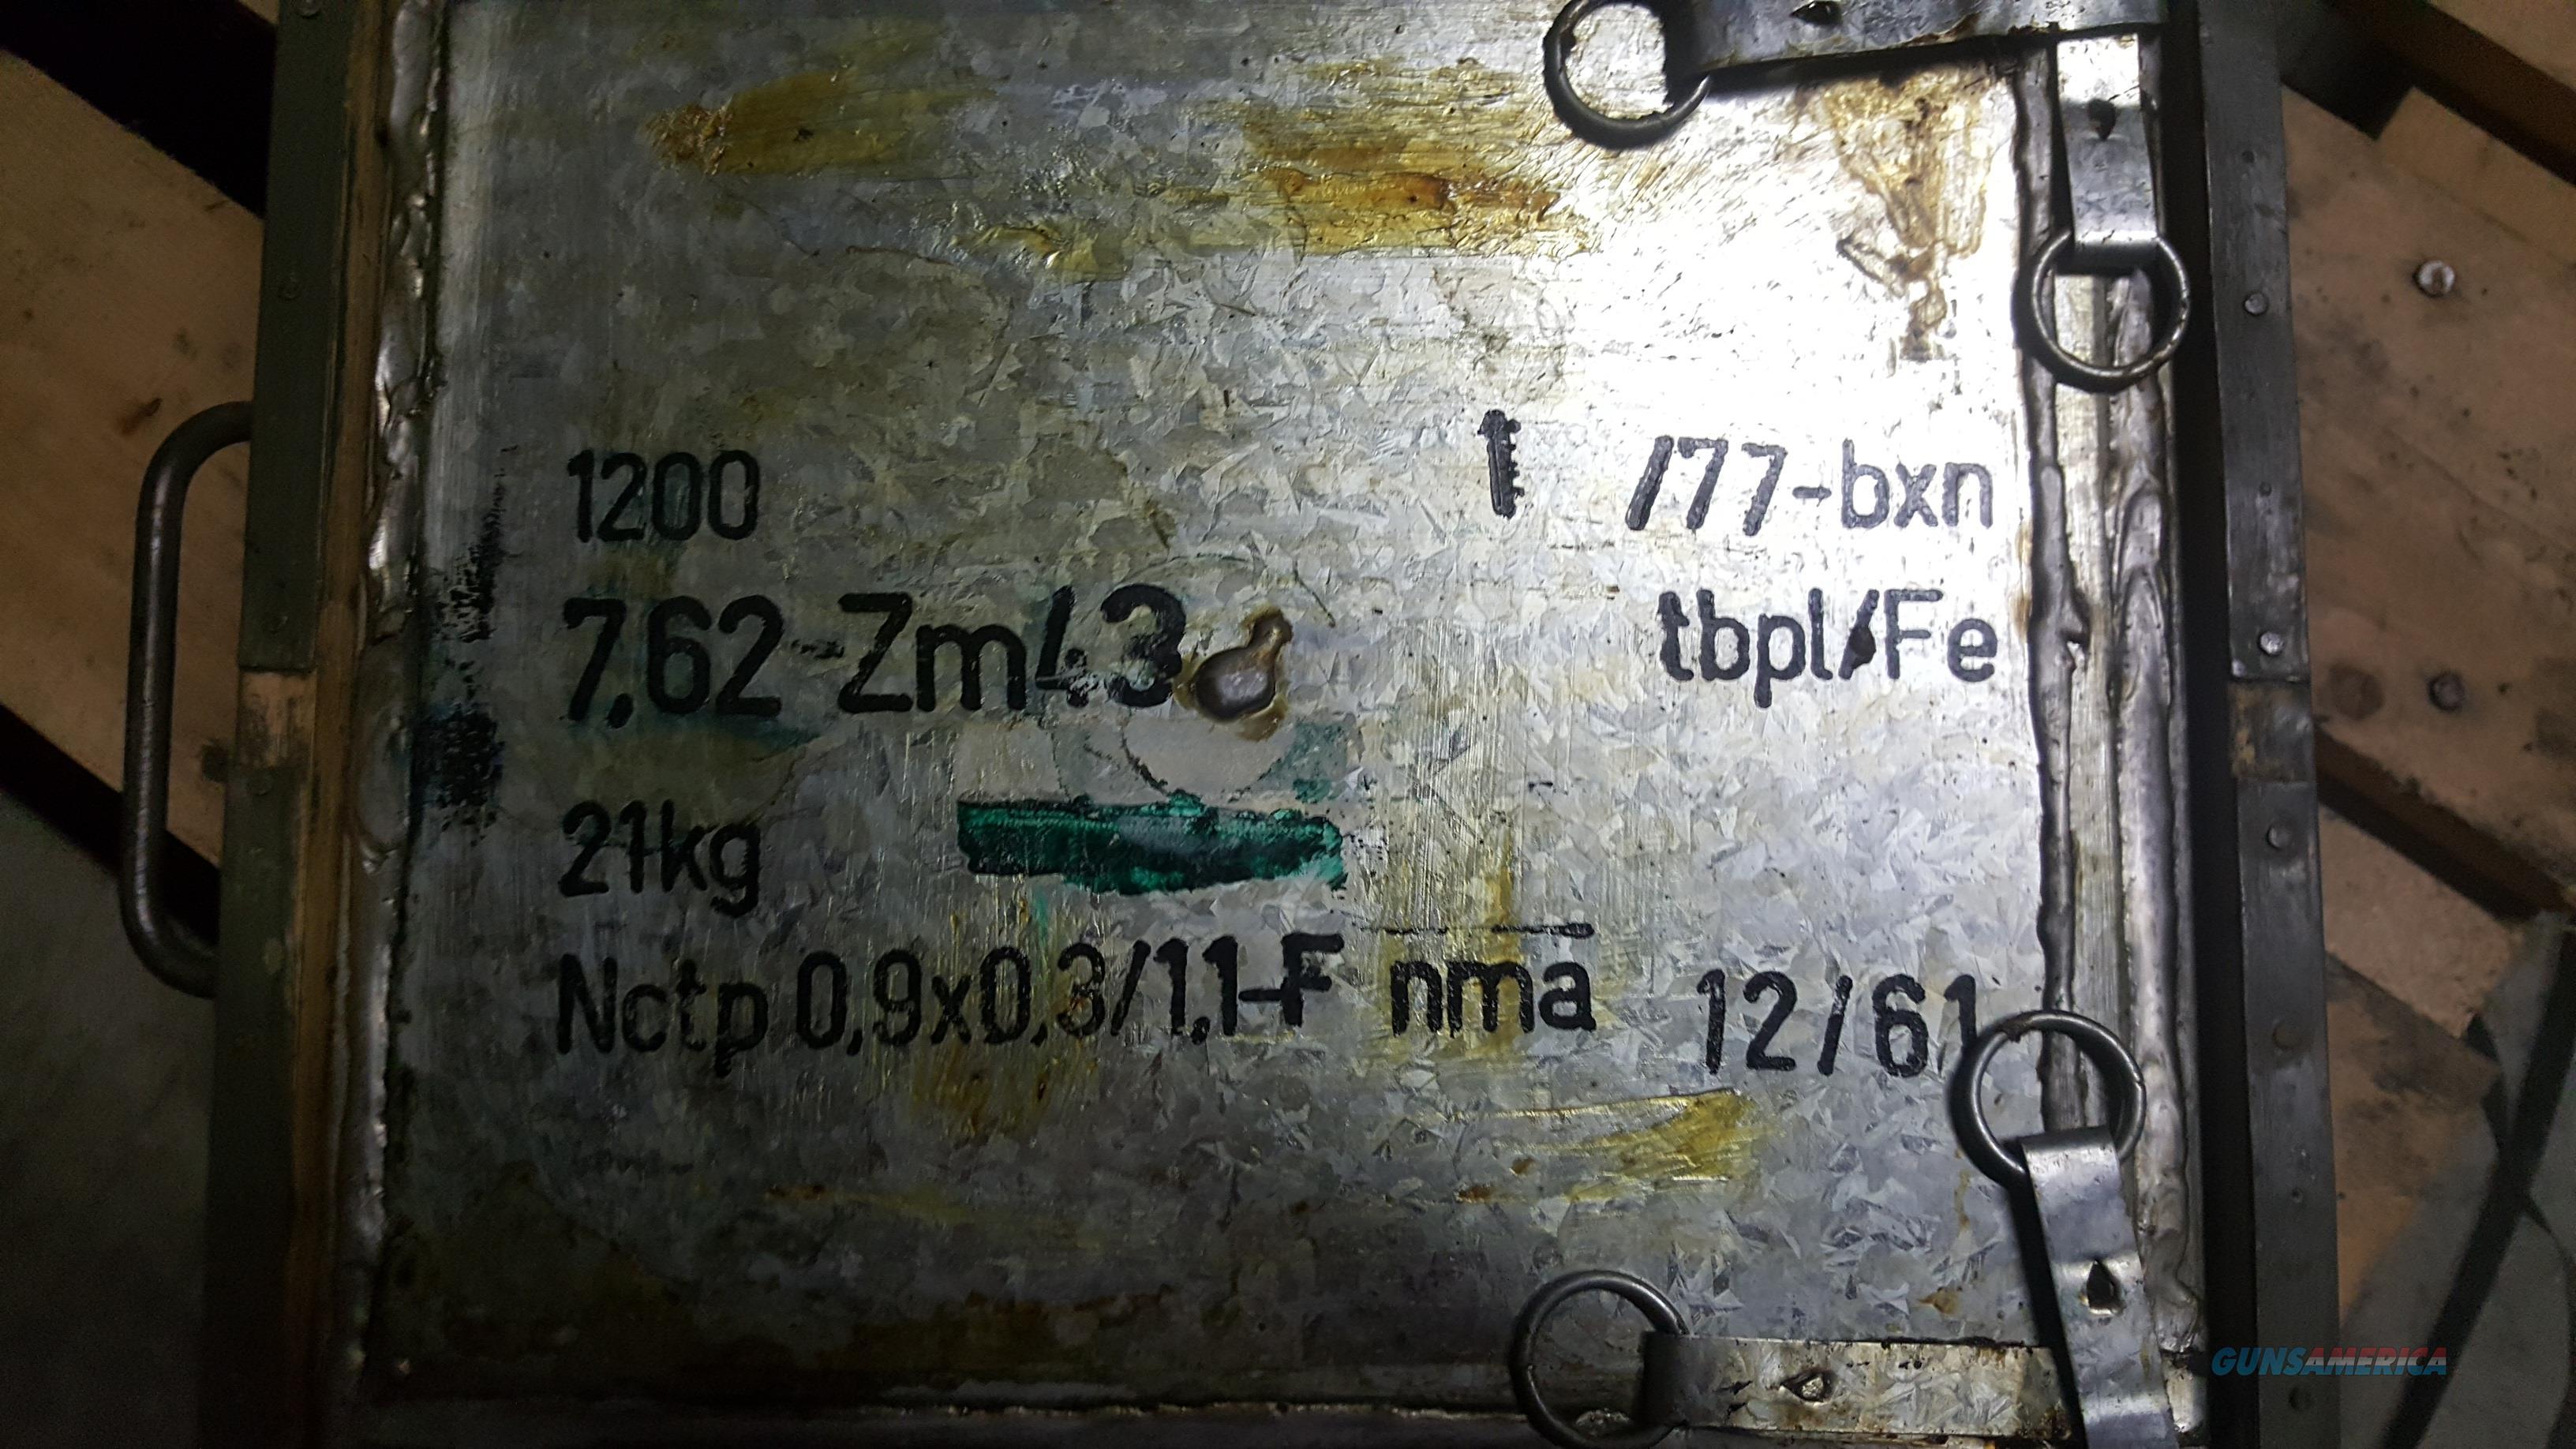 7.62 x 39 spotter tracer rounds ! Zm43   Non-Guns > Ammunition